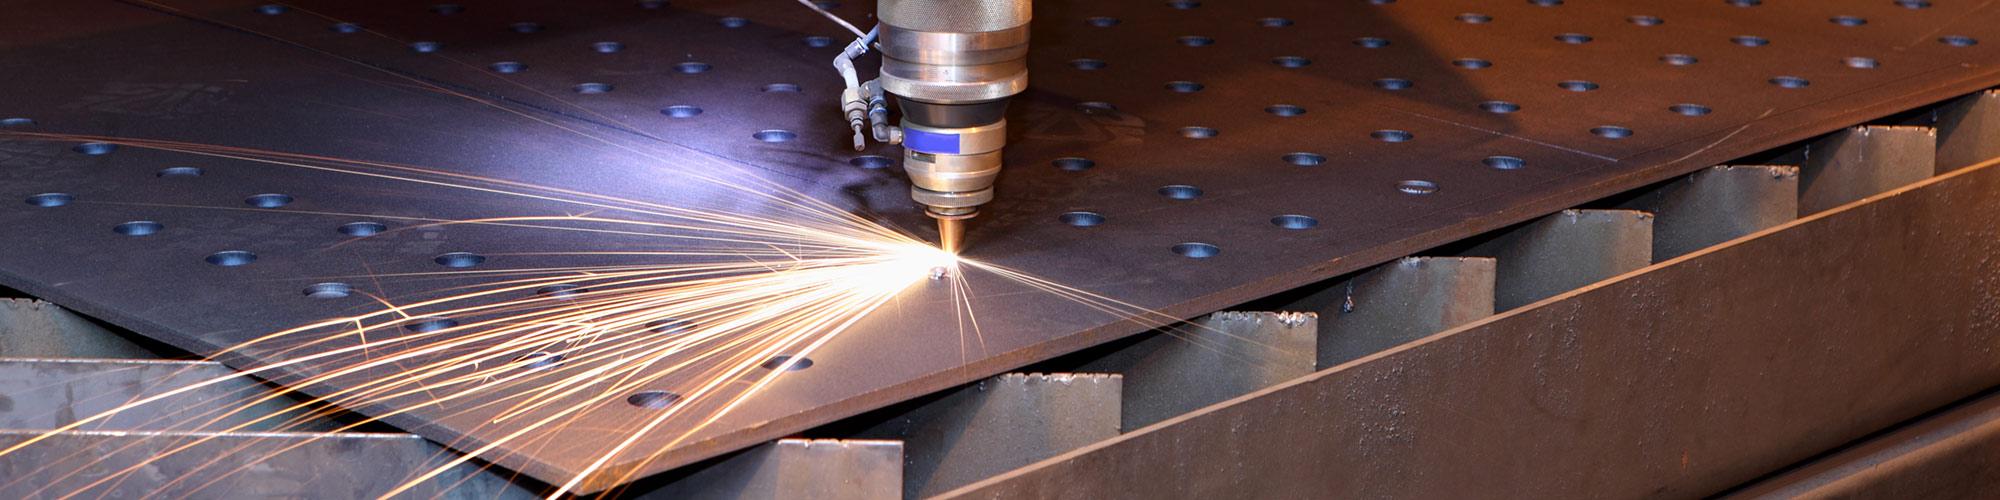 Machine welding